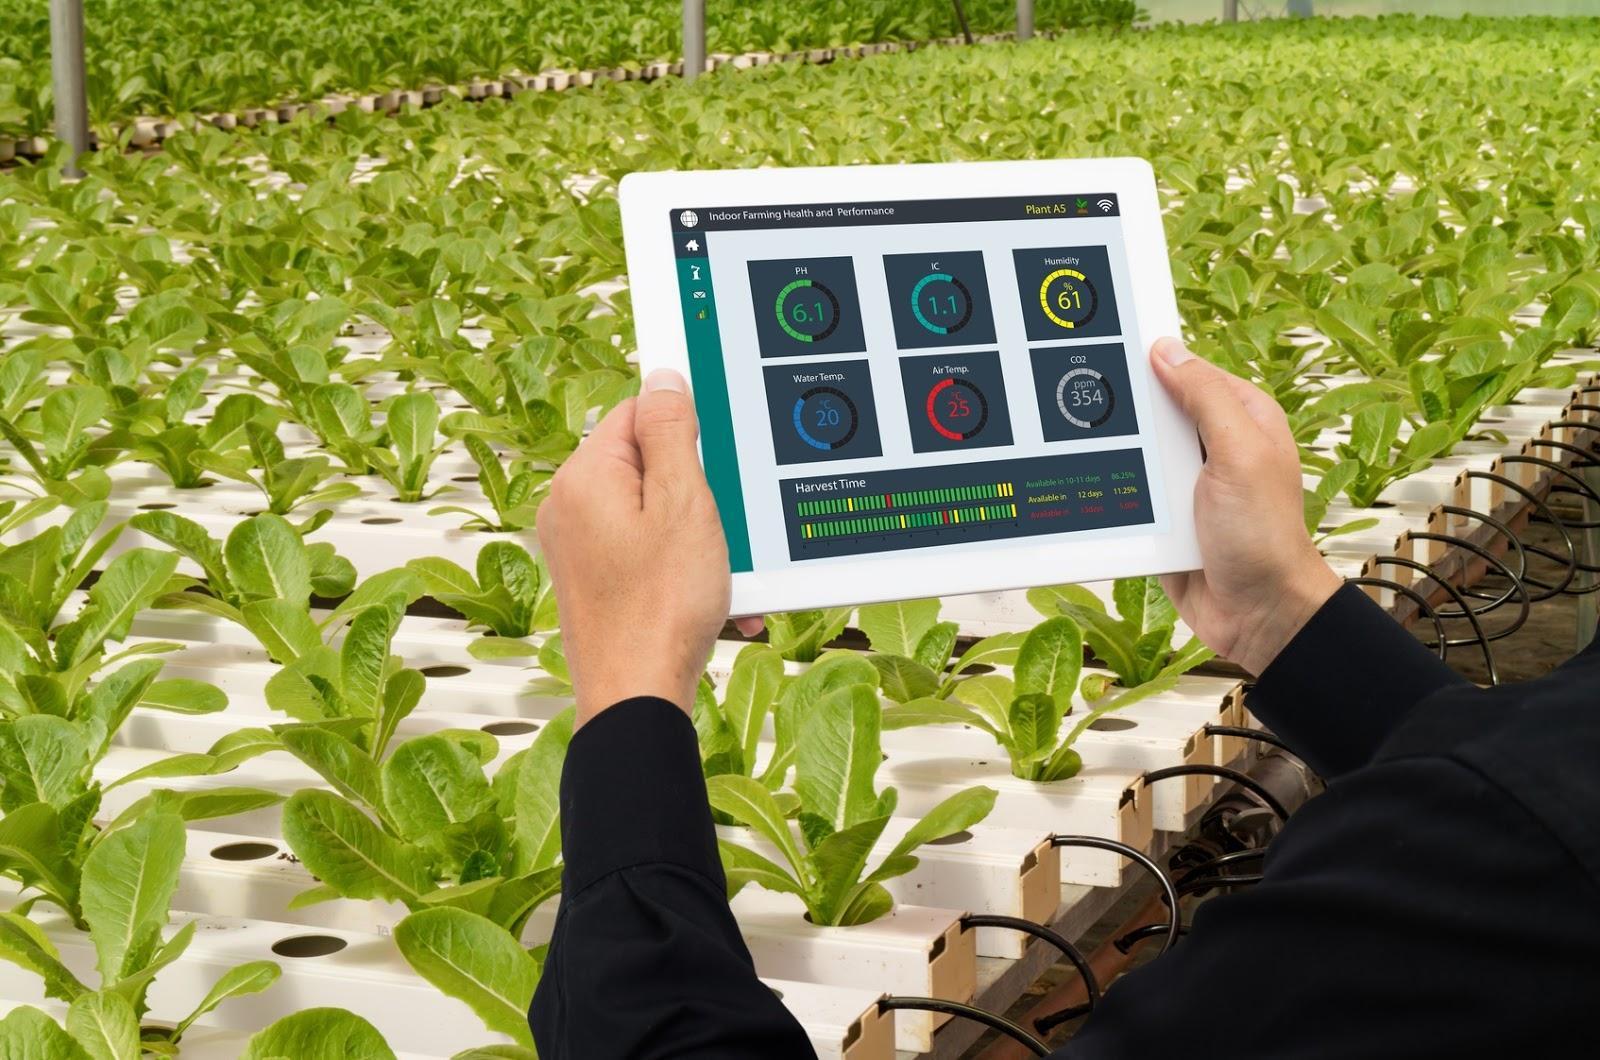 agricultura-4.0-big-data-campo